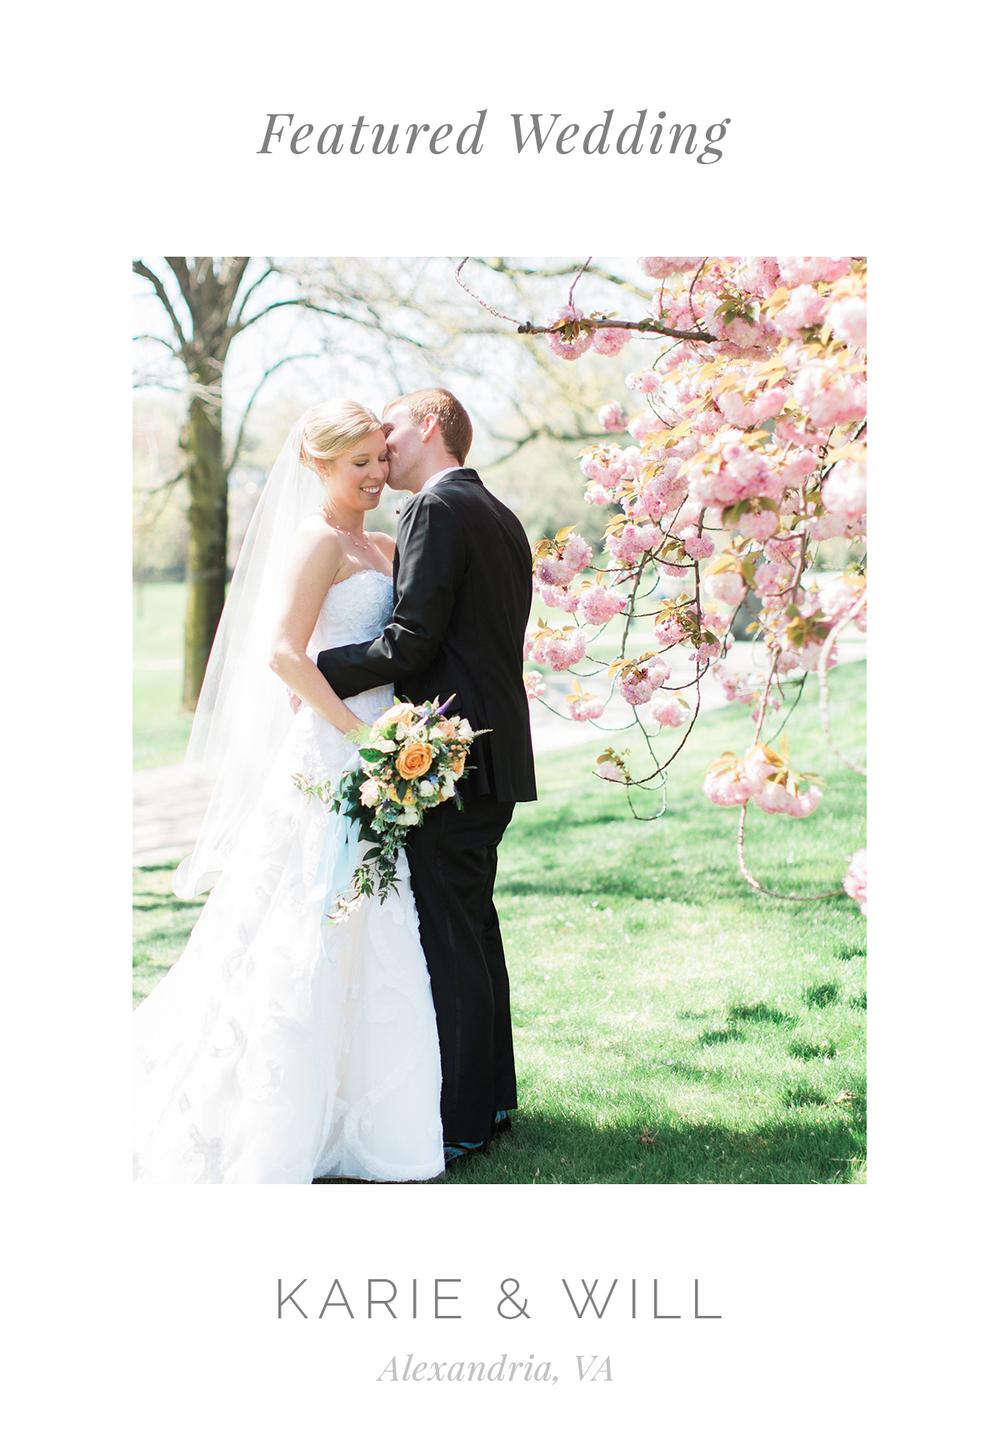 Featured Wedding Karie & Will.jpg